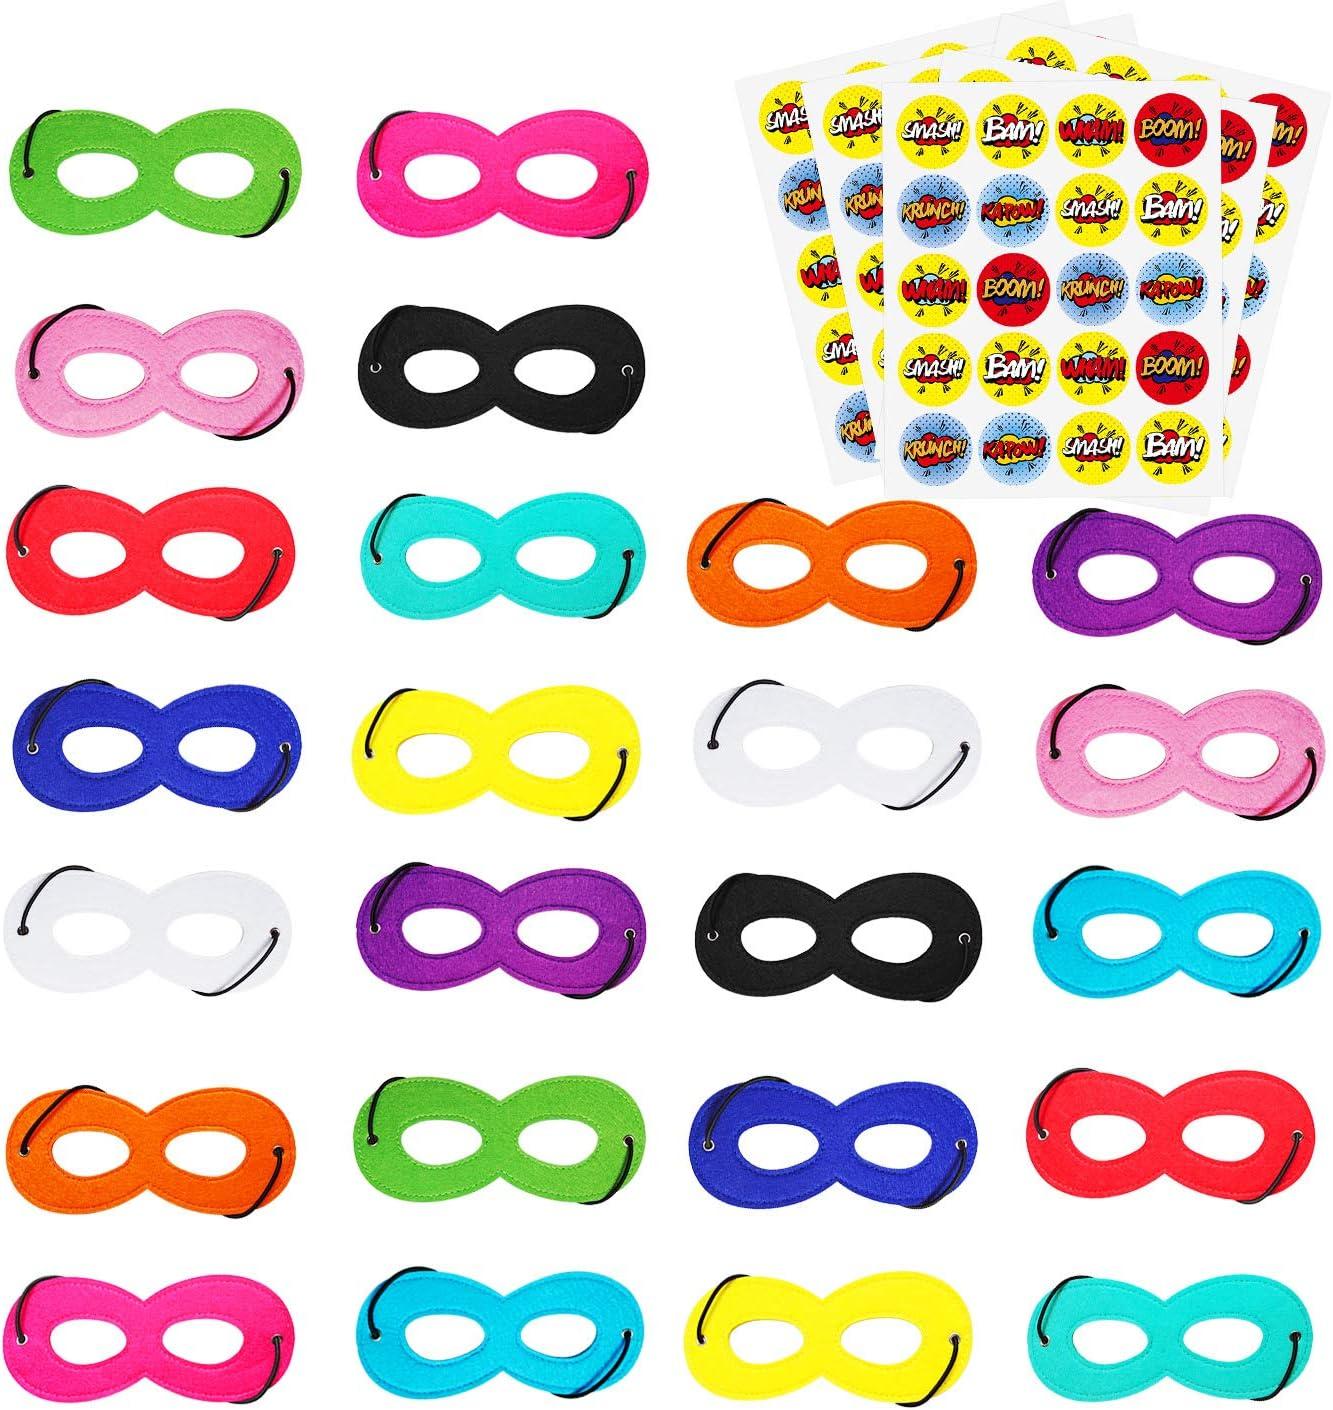 AIMIKE Superhero Masks, Cosplay Party Favors, Superhero Eye Masks for Kids with 100 Round Superhero Stickers, 24Pcs Multicolor Masks